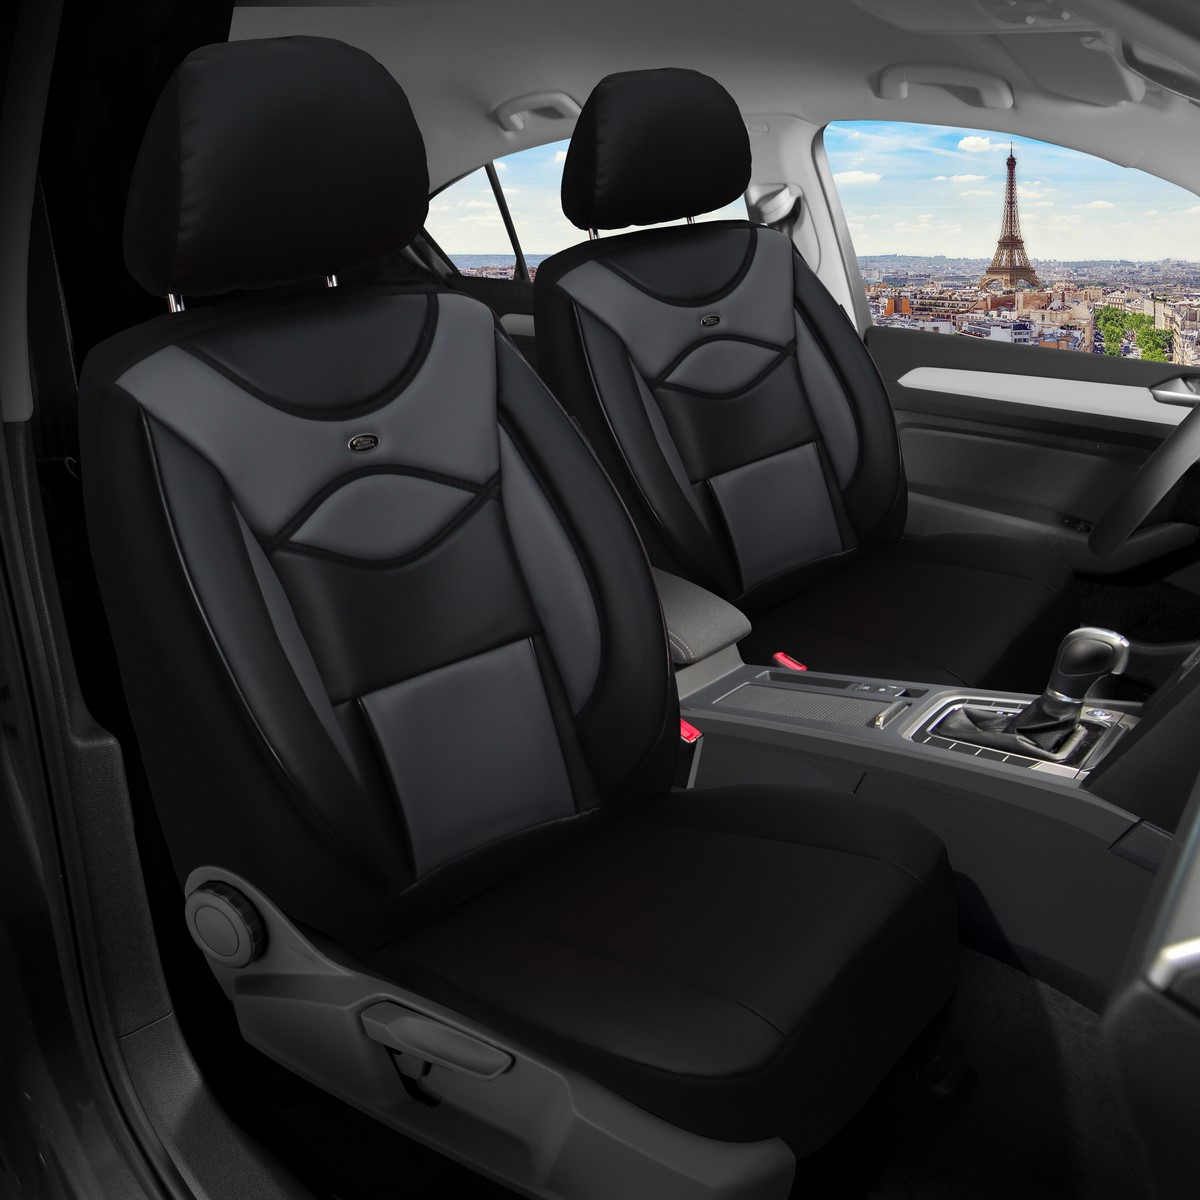 Maß Sitzbezüge Volvo V50 Fahrer /& Beifahrer ab 2004-2012 FB:D101